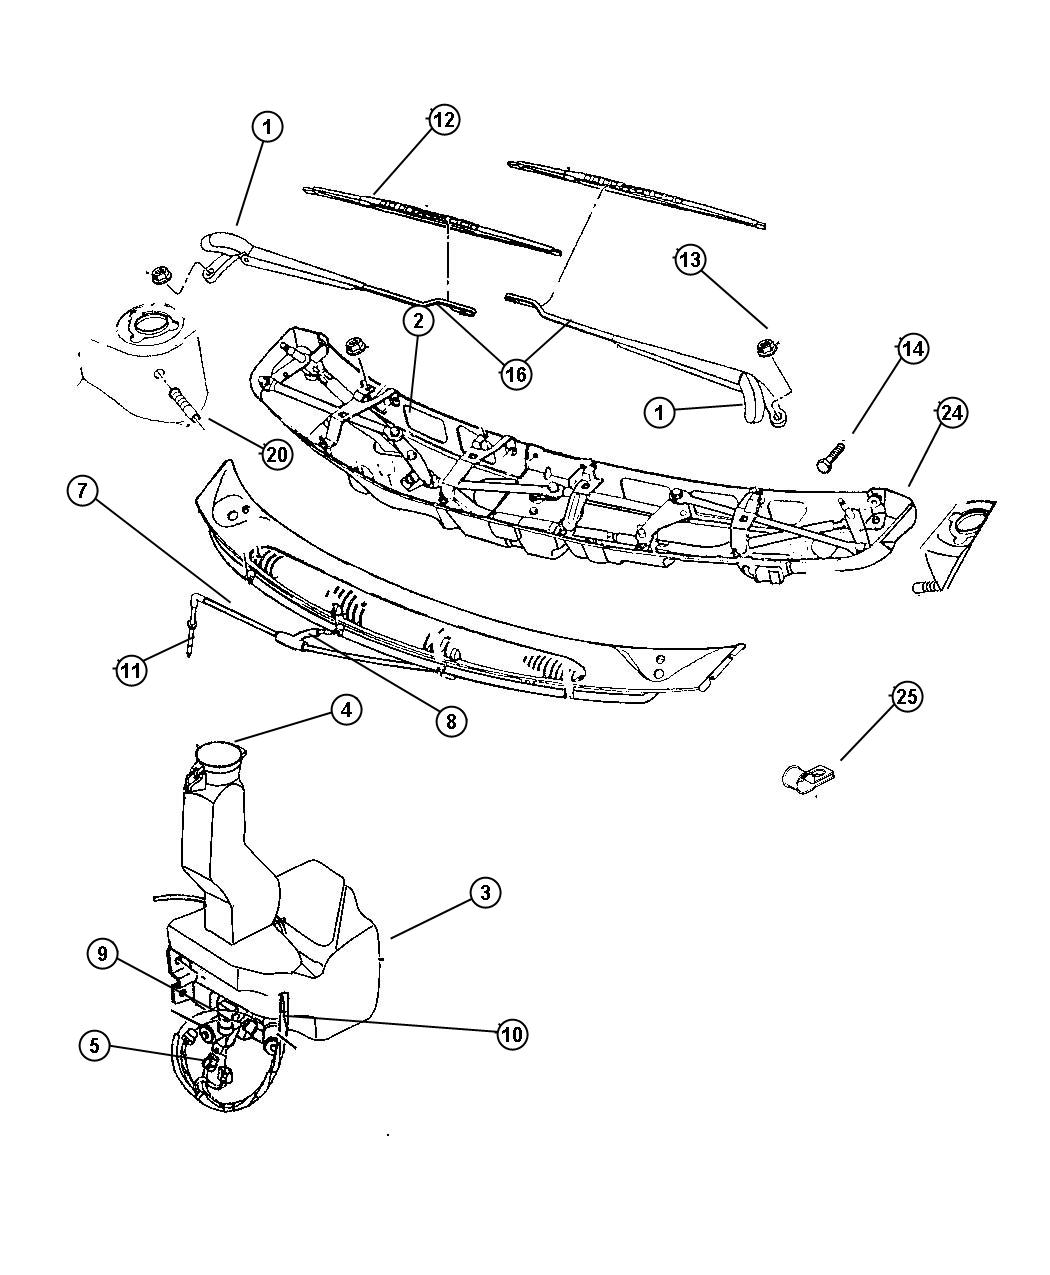 Dodge Ram Nozzle Washer Windshield Washer Wiper Body